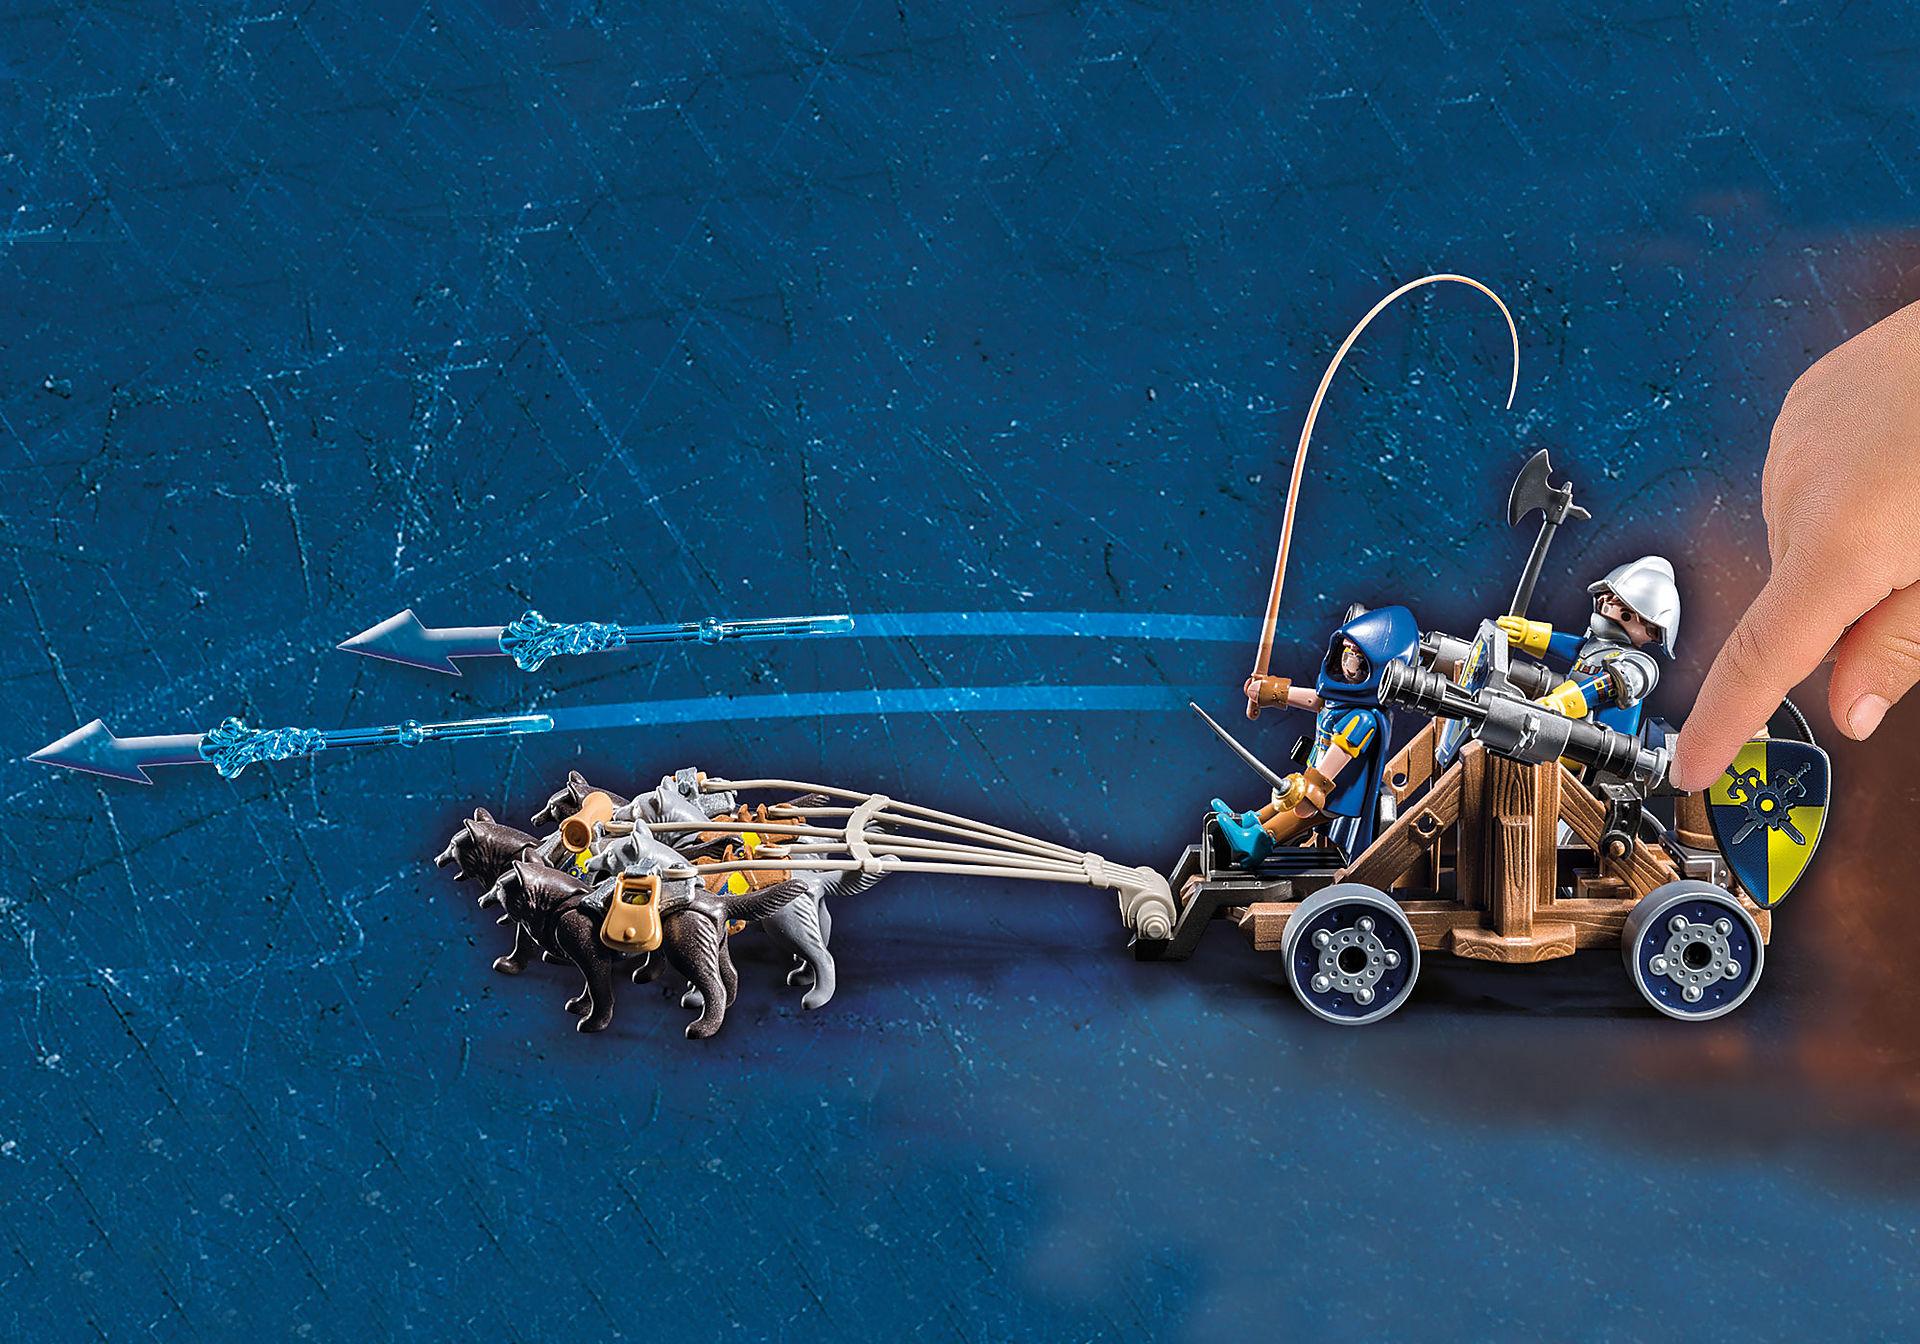 http://media.playmobil.com/i/playmobil/70225_product_extra1/Novelmore ridders met waterkanon en wolven